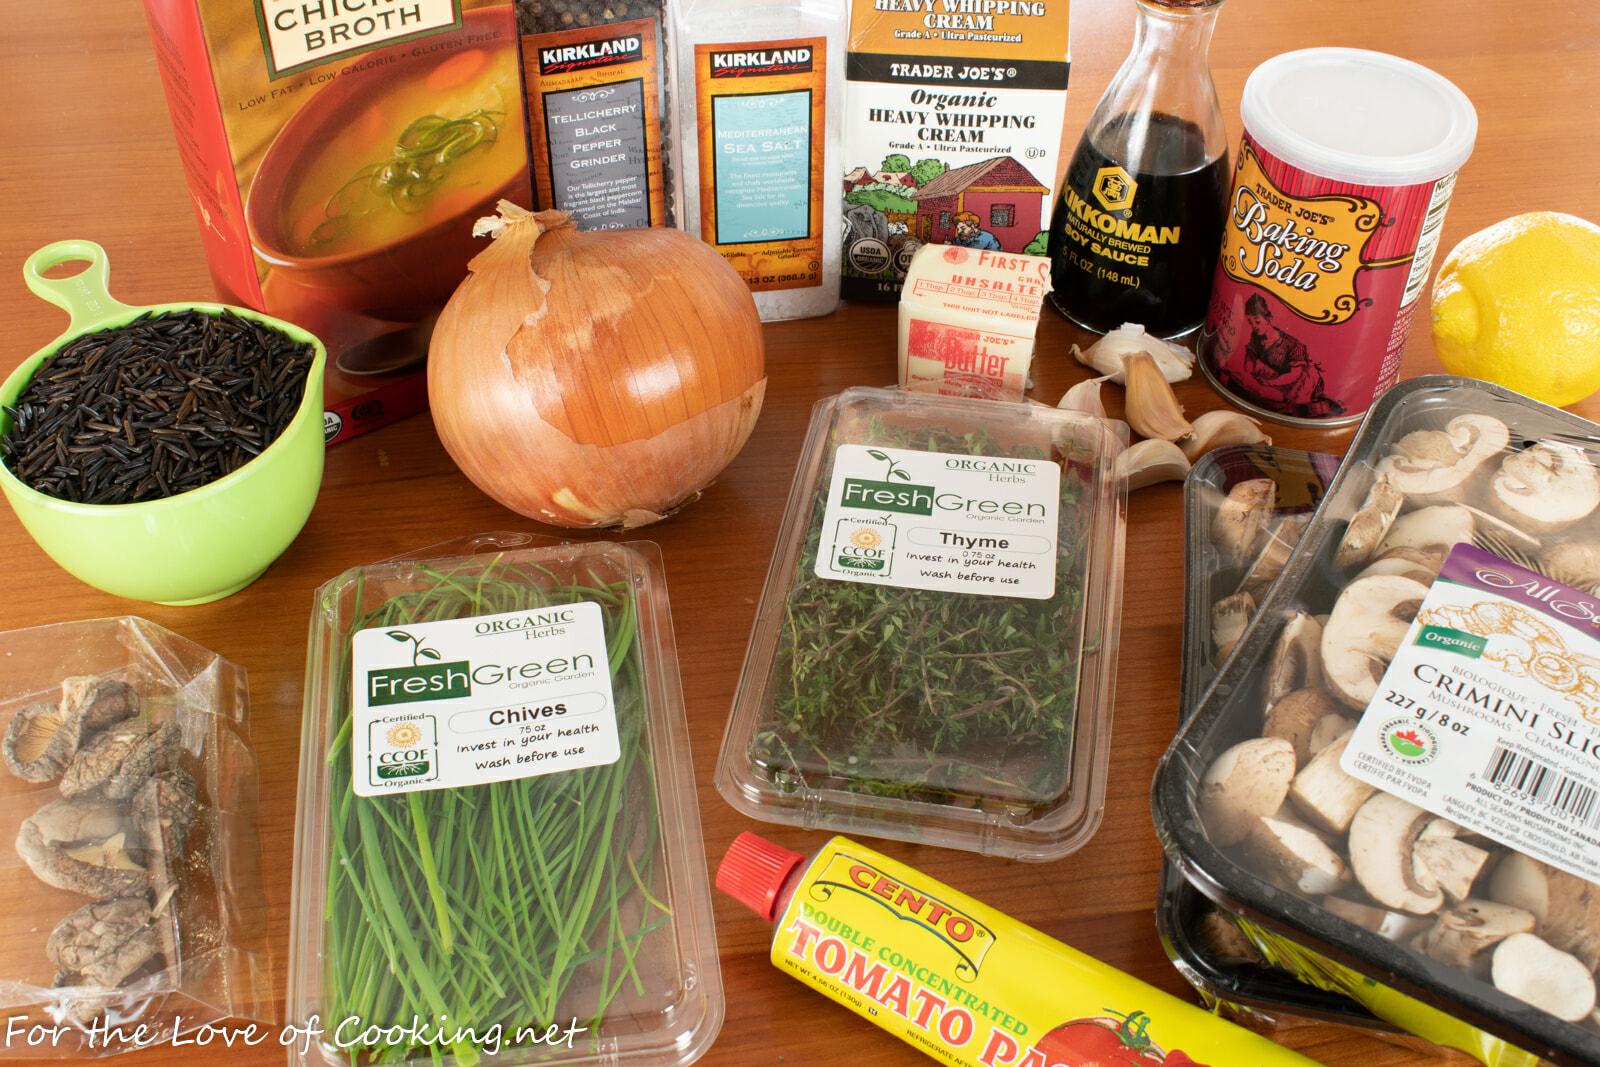 Wild Rice and Mushroom Soup